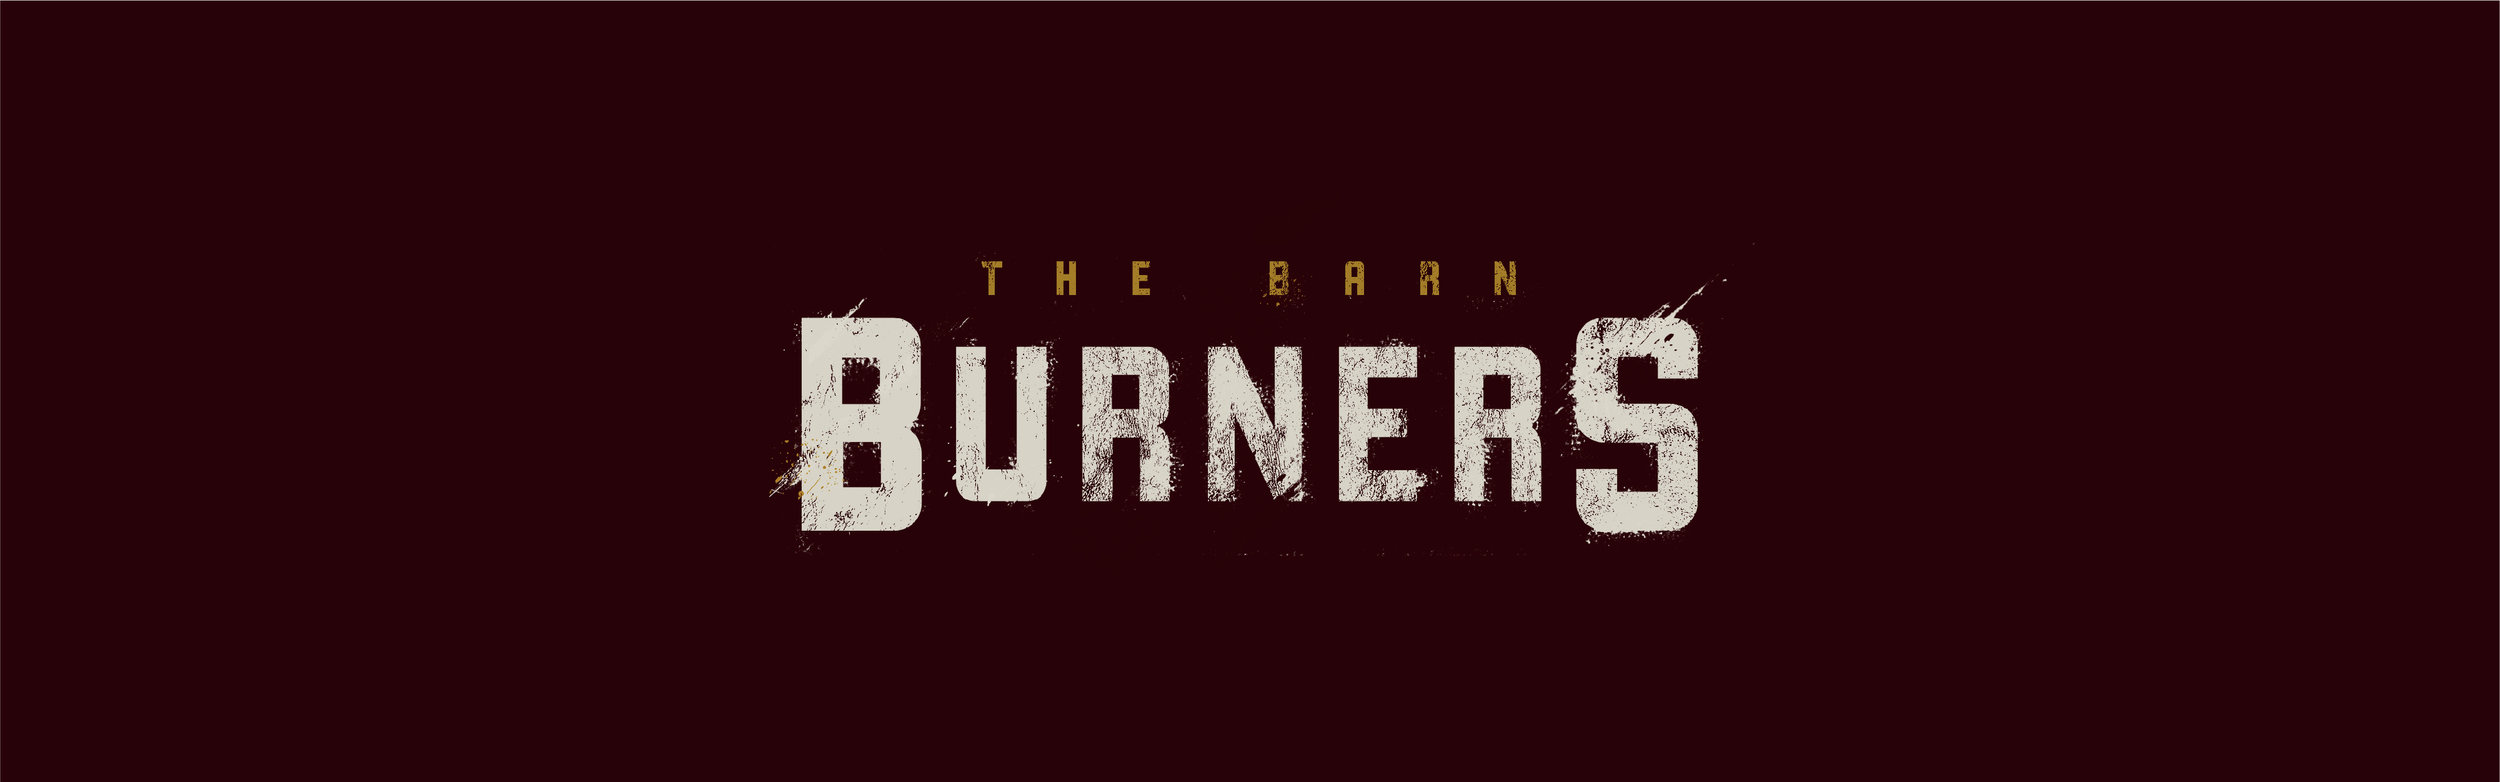 Barn Burners case study-05.jpg